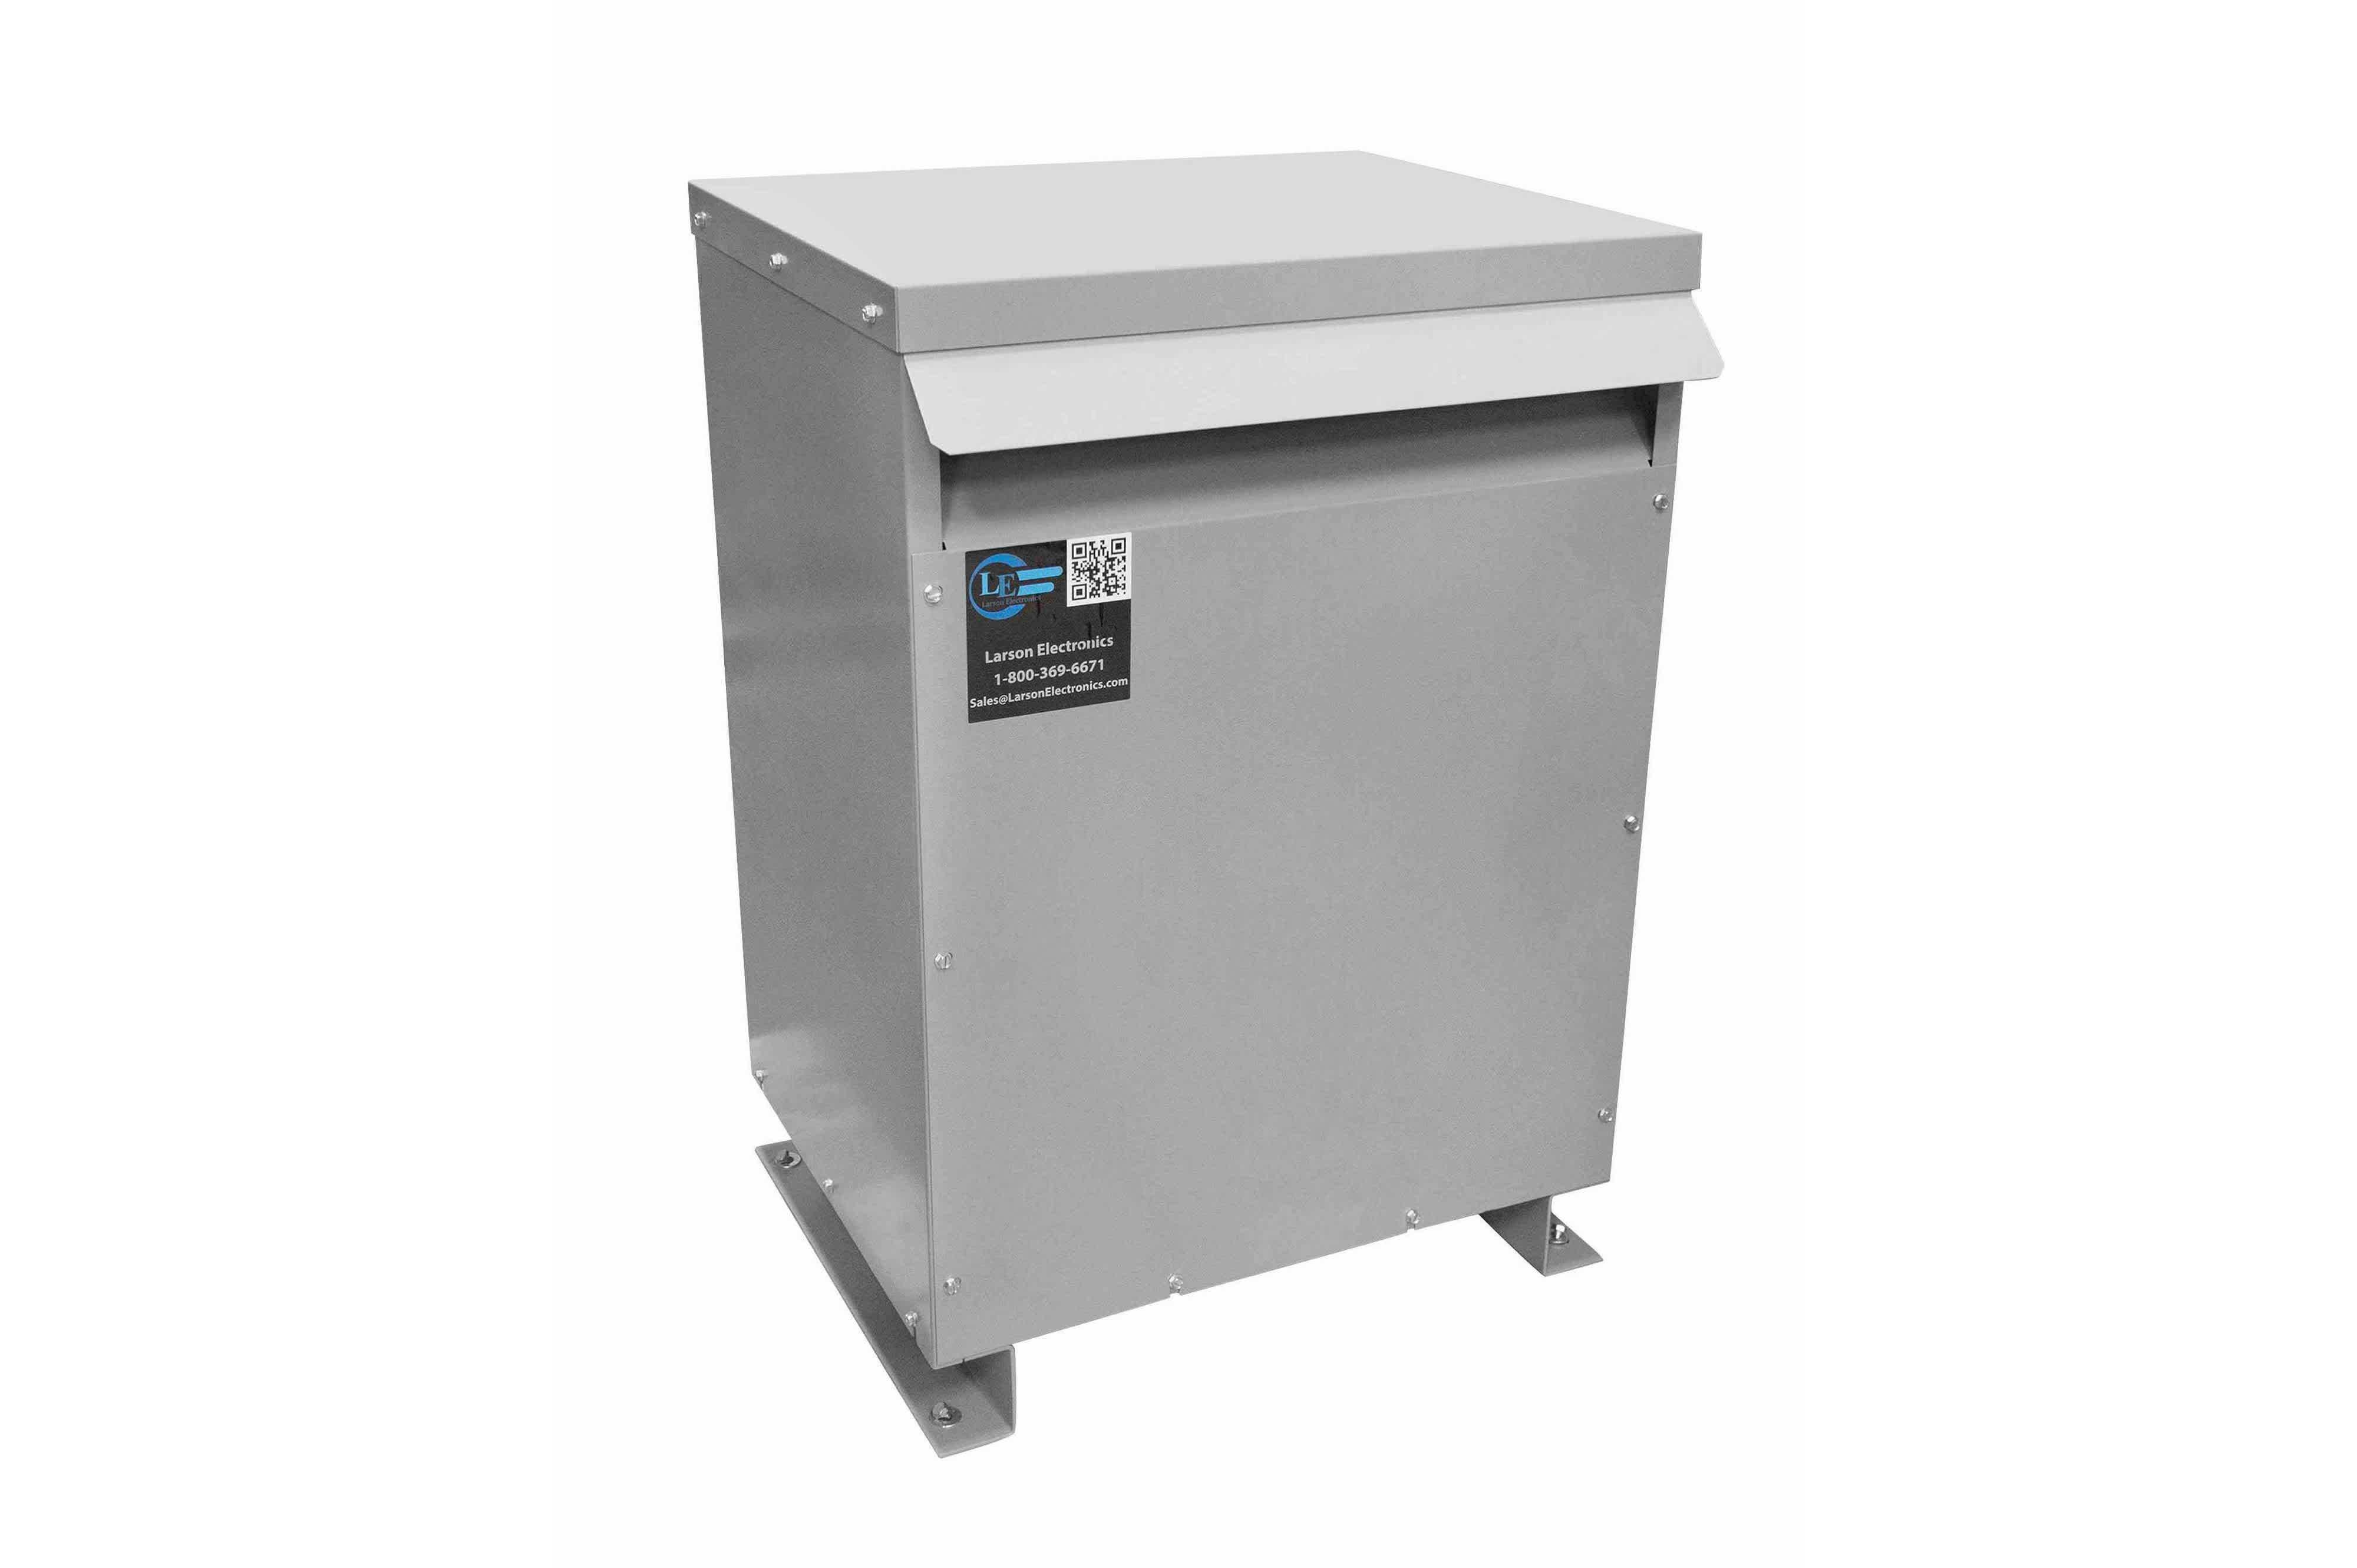 500 kVA 3PH DOE Transformer, 220V Delta Primary, 208Y/120 Wye-N Secondary, N3R, Ventilated, 60 Hz